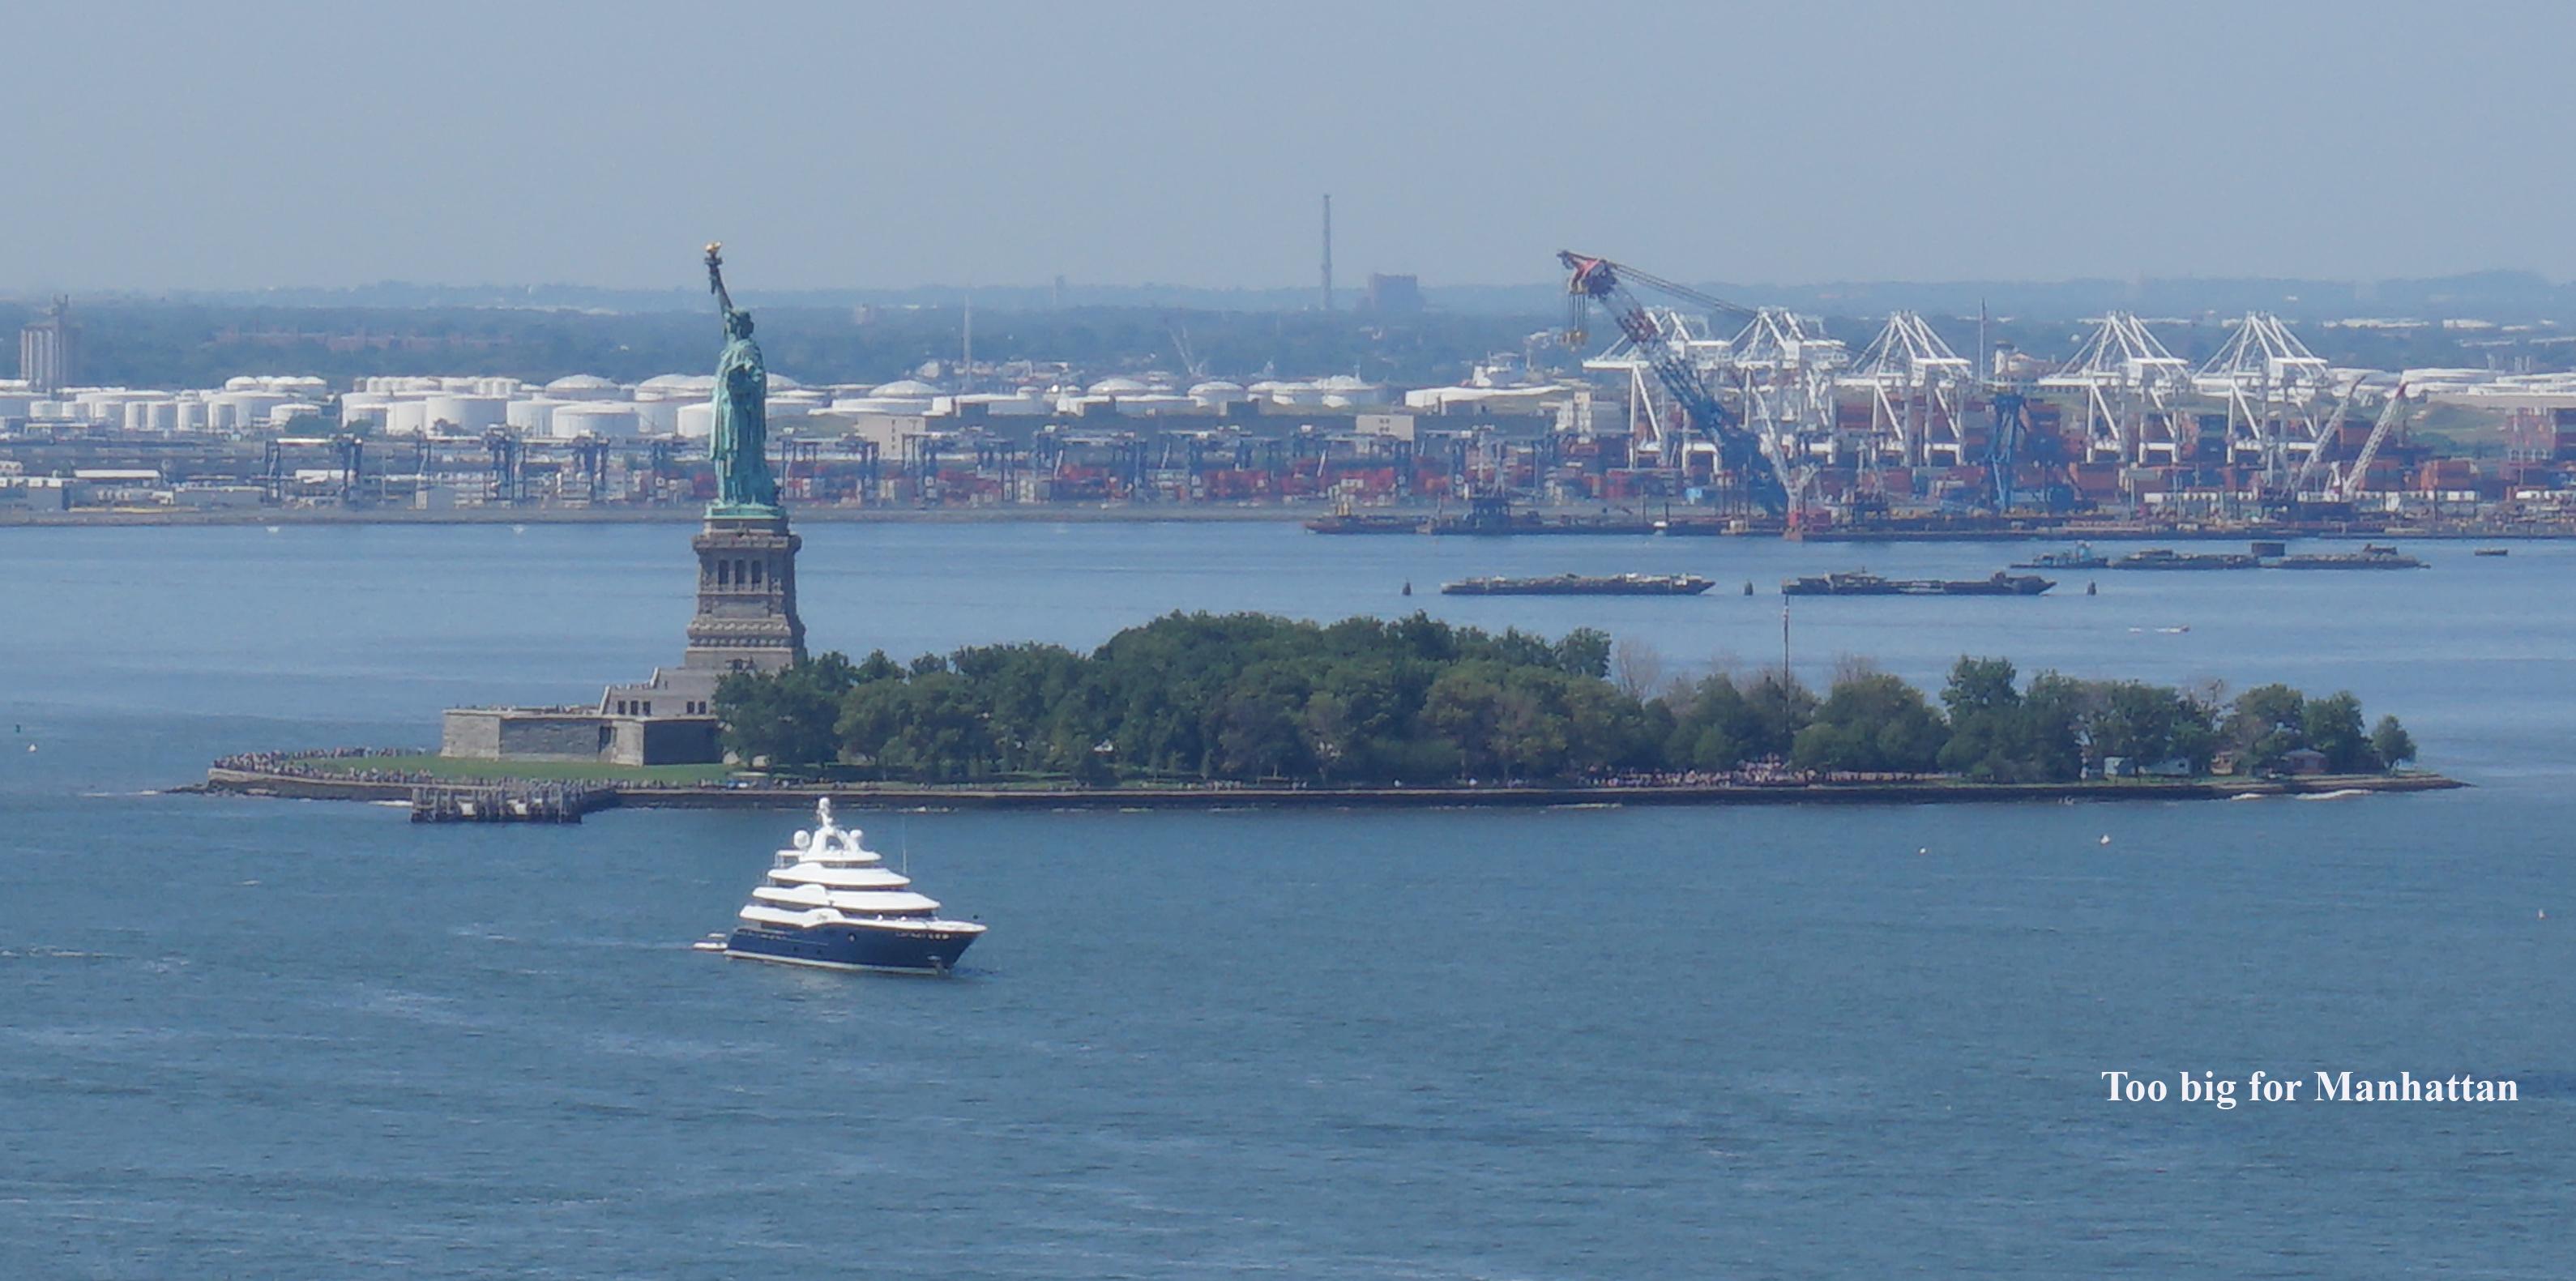 Ship too big to park in Manhattan port